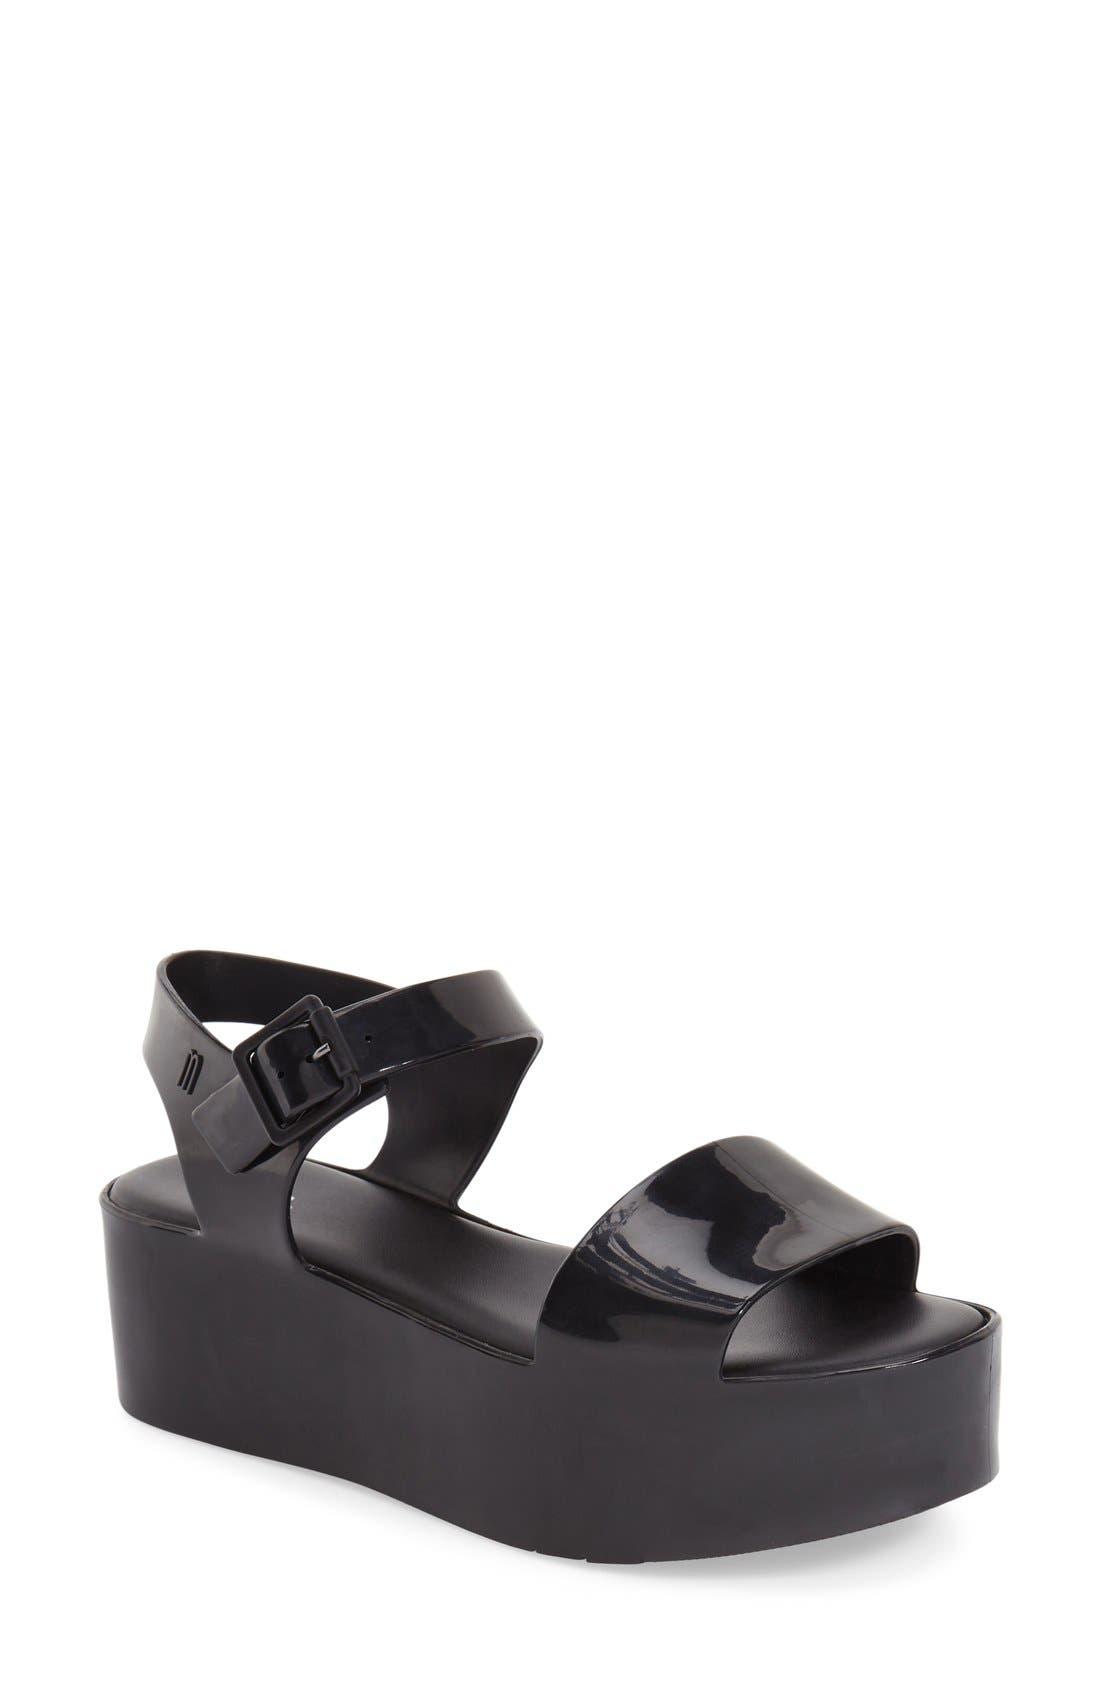 Alternate Image 1 Selected - Melissa 'Mar' Platform Sandal (Women)